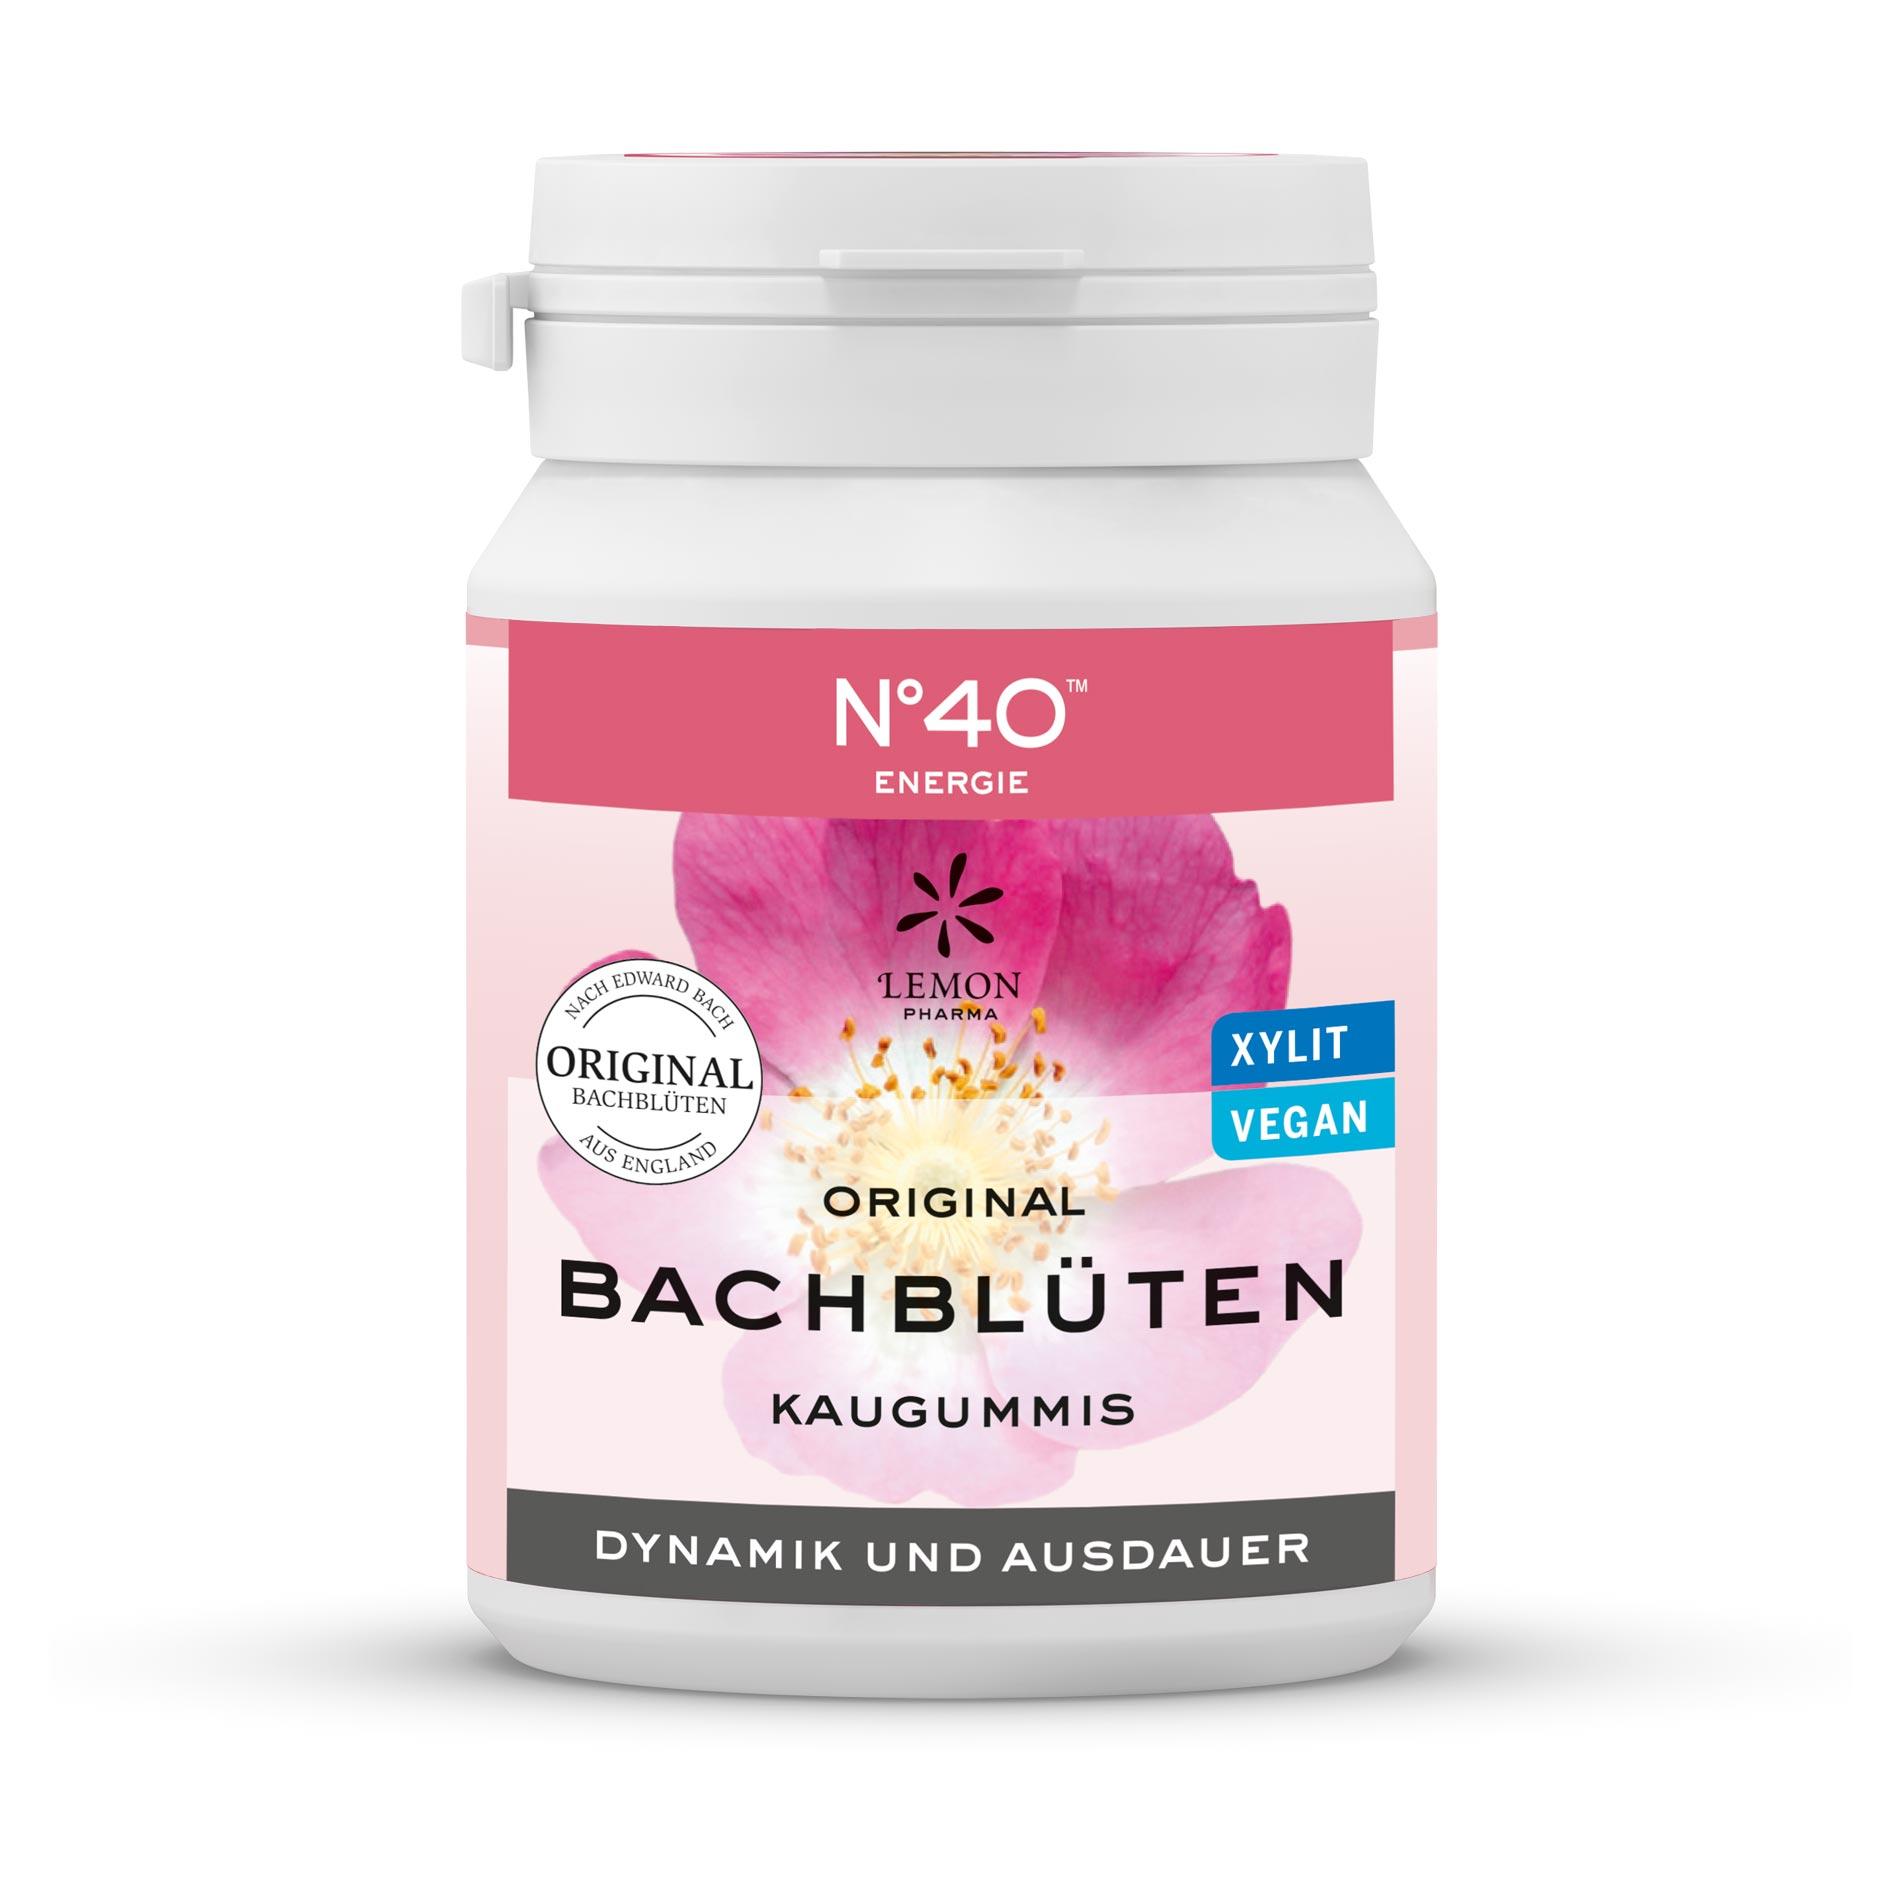 Kaugummi 40 Energie Lemon Pharma Original Bachblüte Bach flowers Dynamik und Ausdauer xylit vegan chewing gum